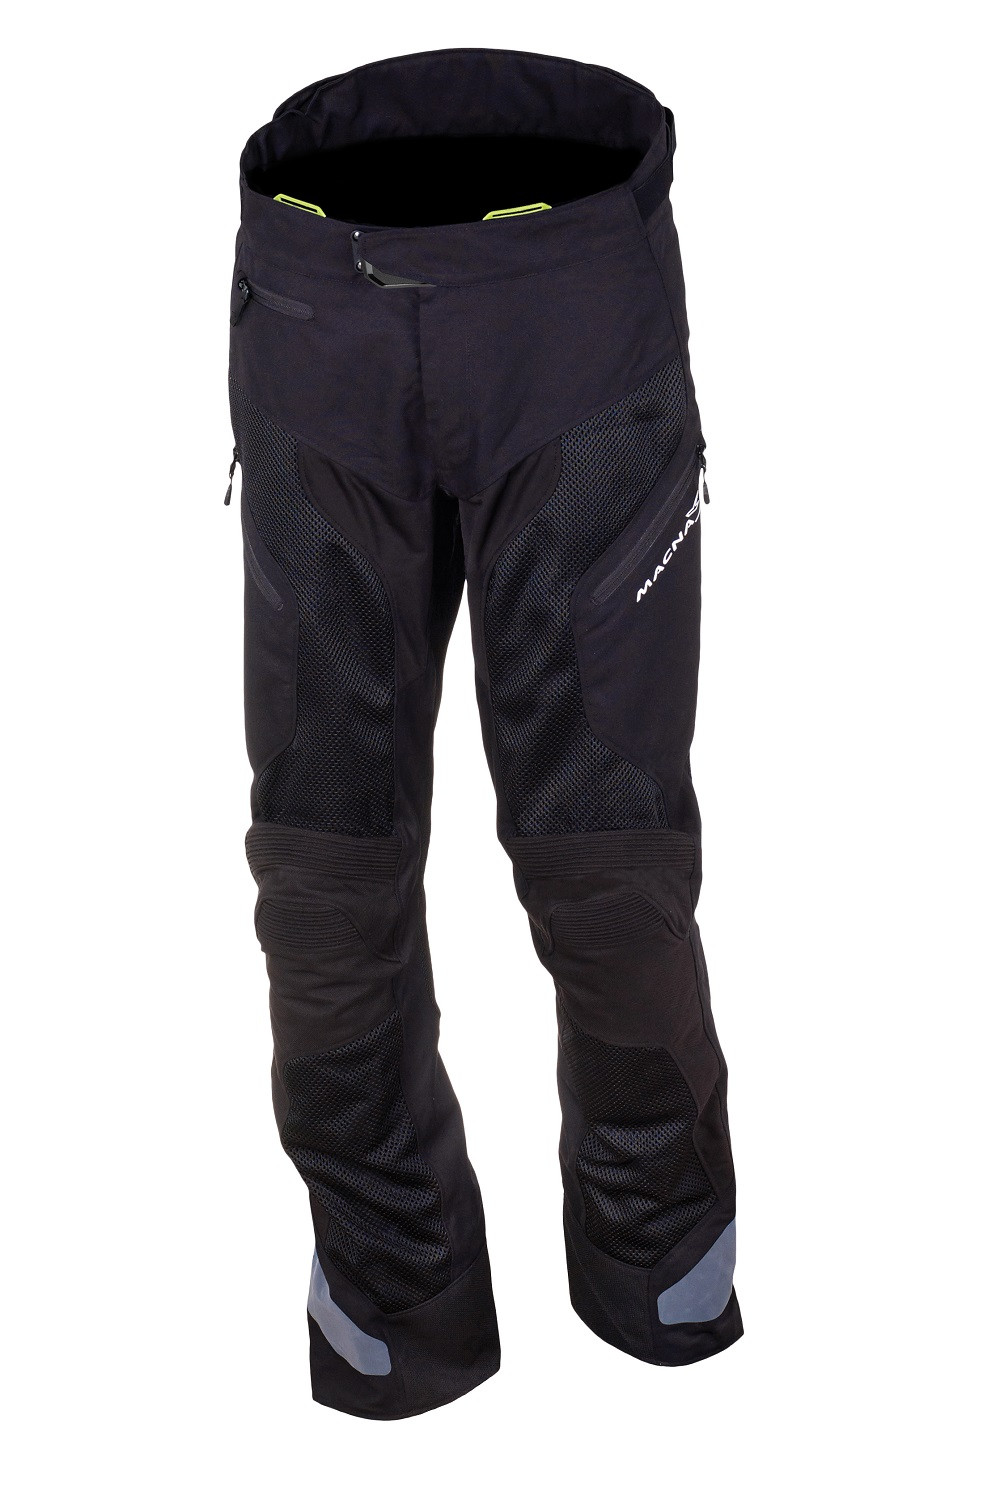 Macna summer trousers Buran black